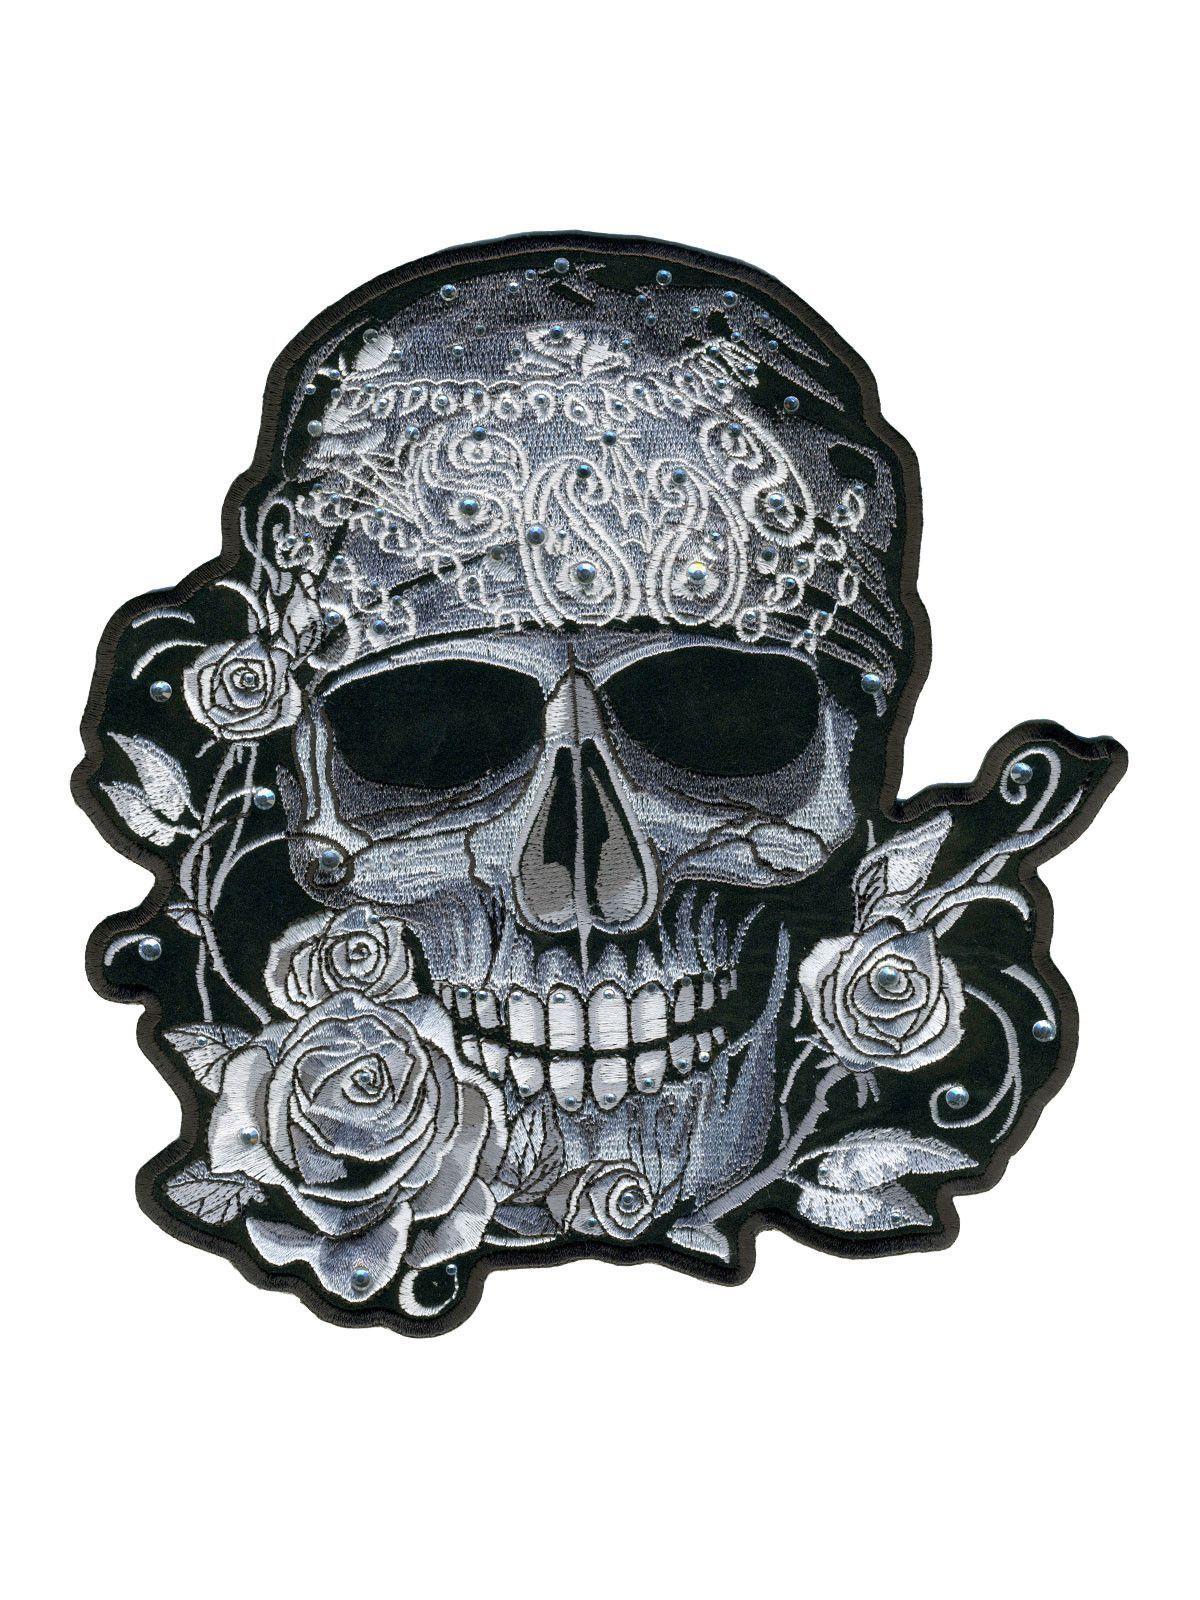 Bandana Skull Patch With Rhinestones 4 x 4 Marquesan